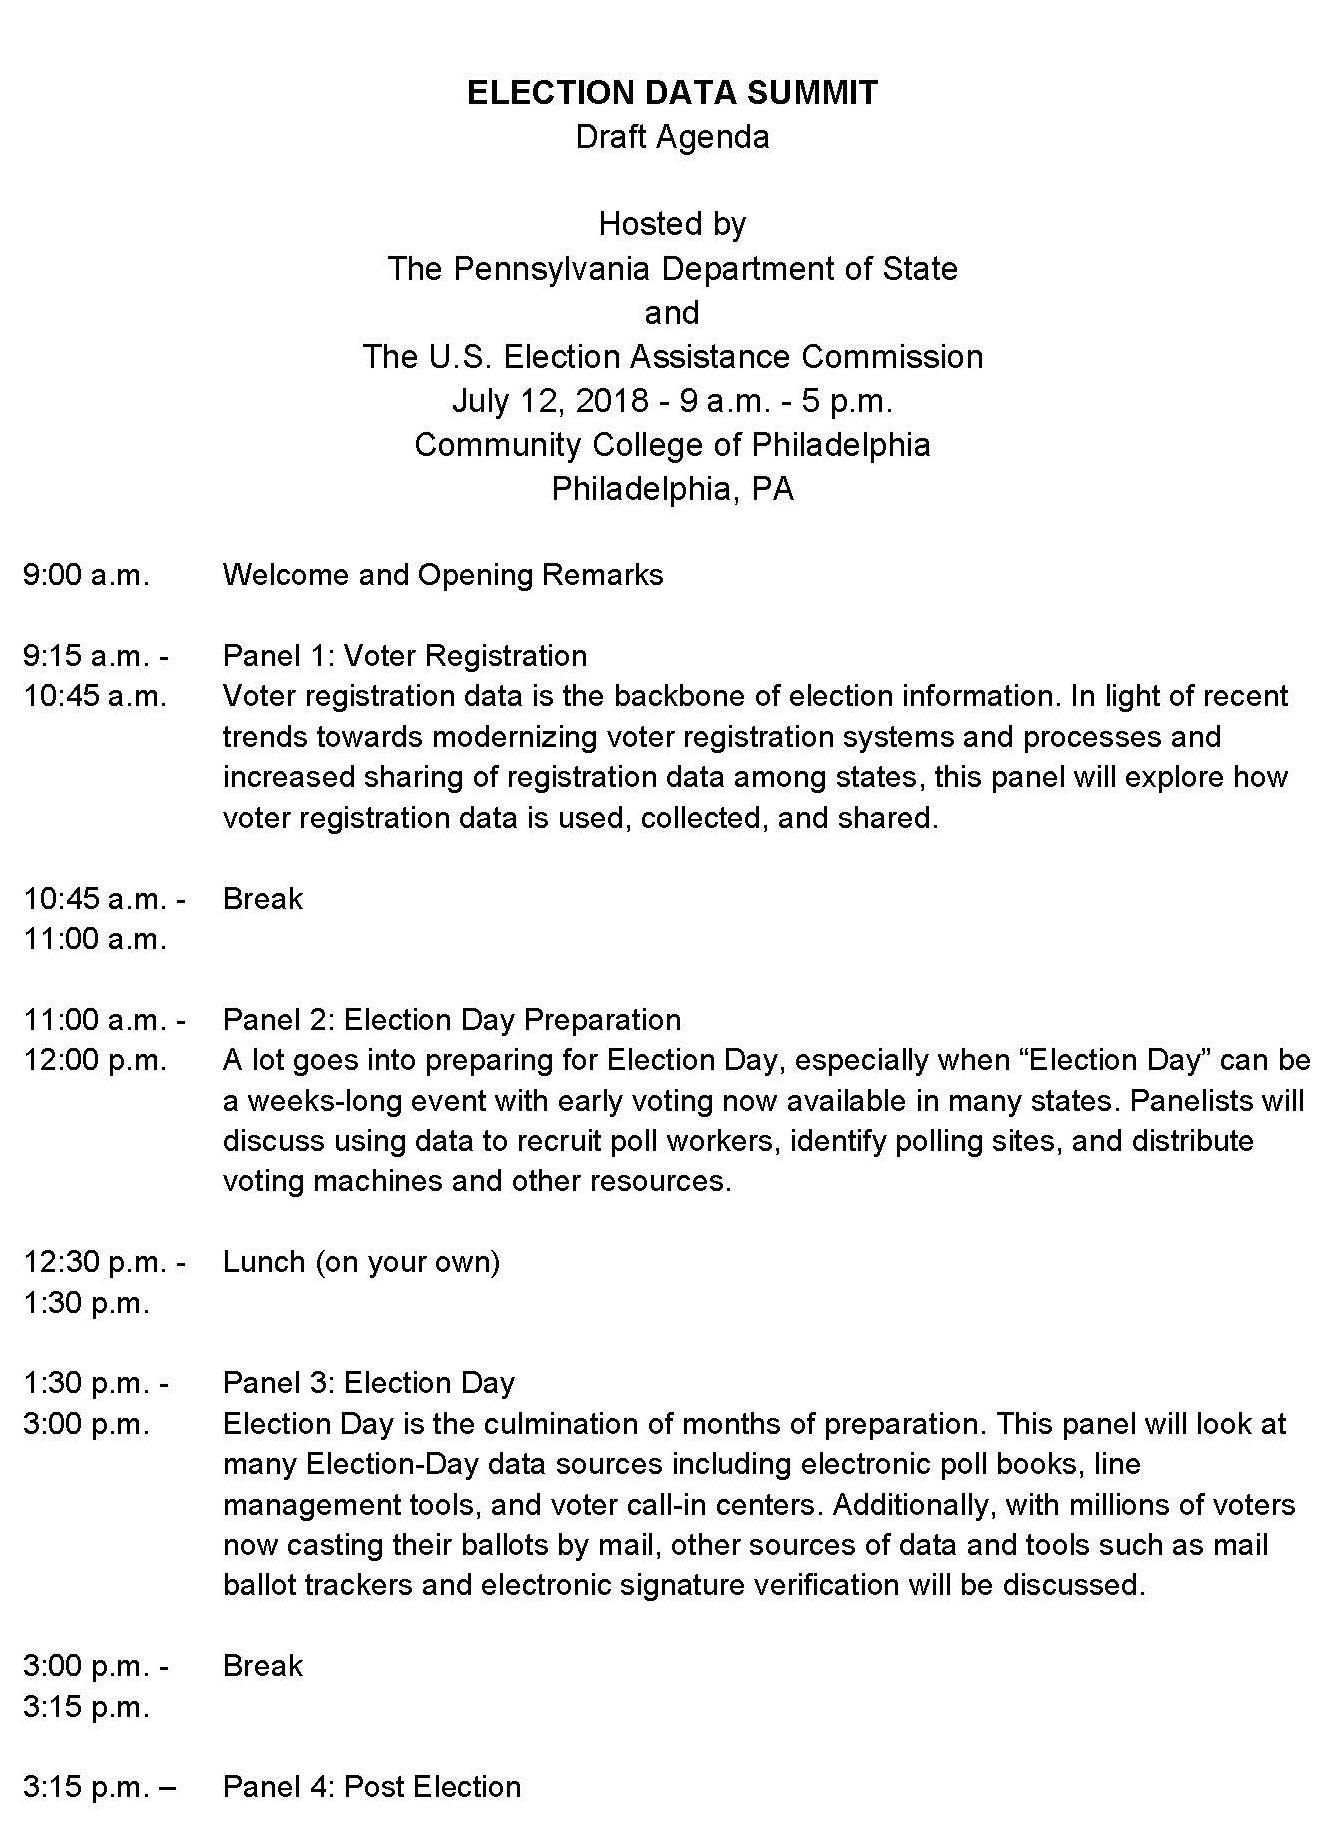 Election Data Summit Draft Agenda Page 1